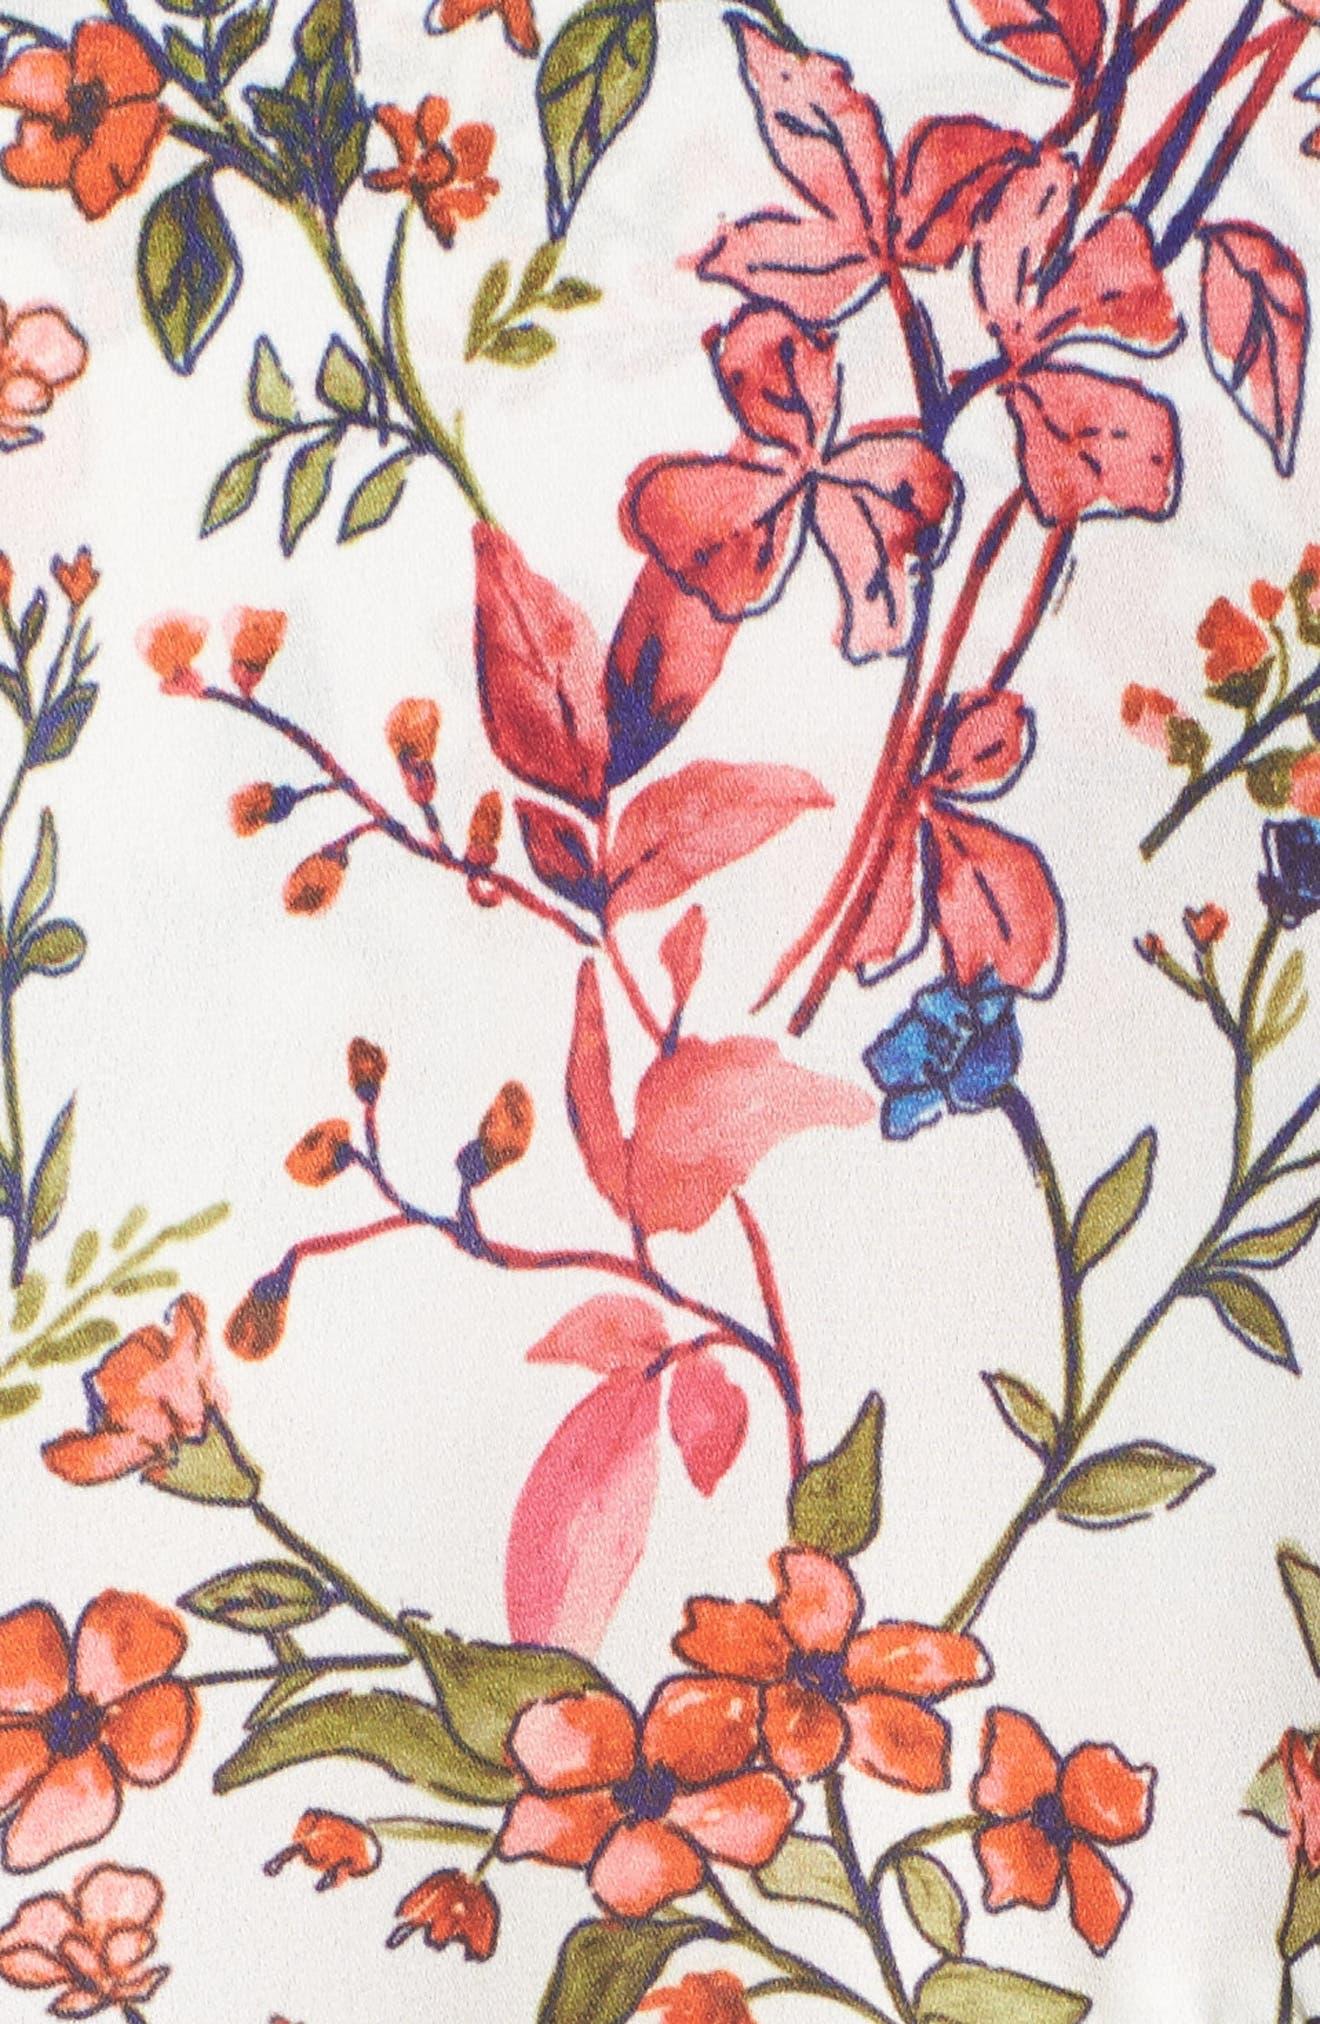 Floral Print Minidress,                             Alternate thumbnail 5, color,                             152